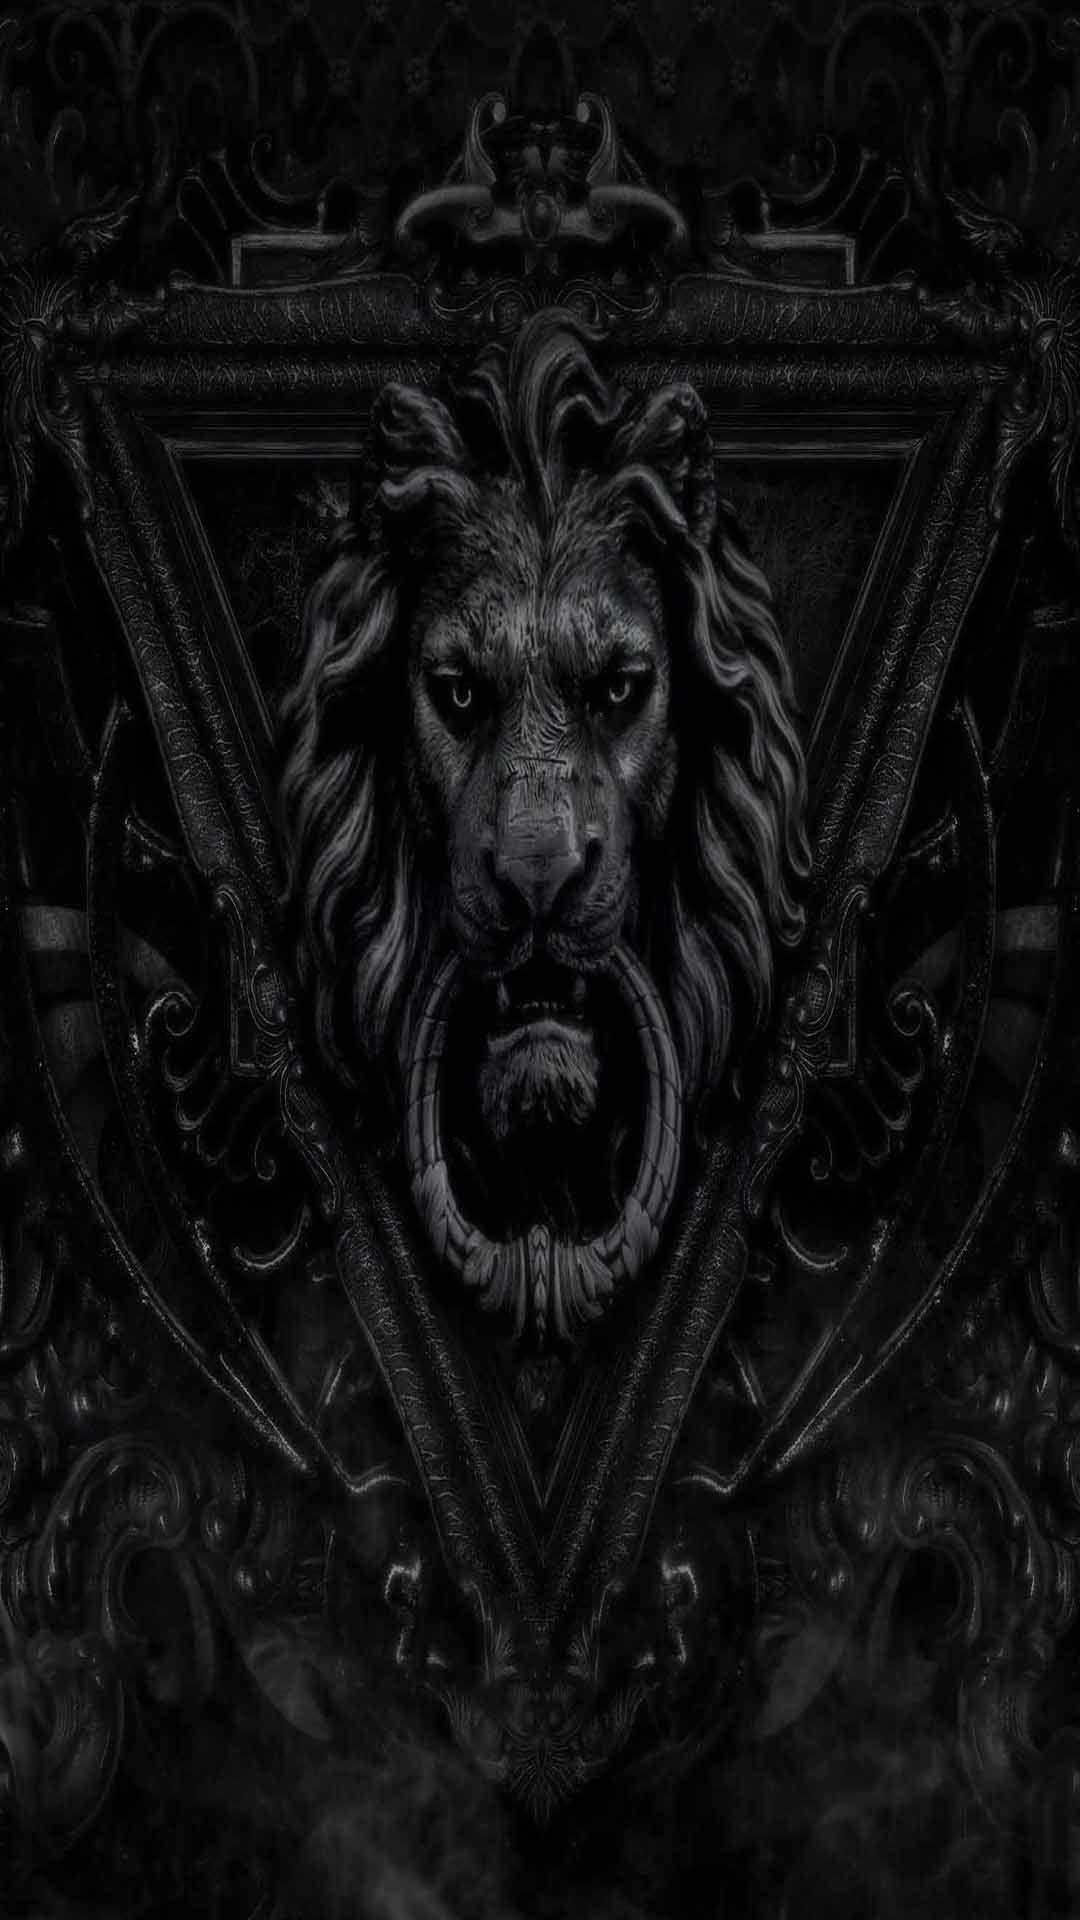 Dark iPhone 5 Wallpapers - Top Free Dark iPhone 5 ...